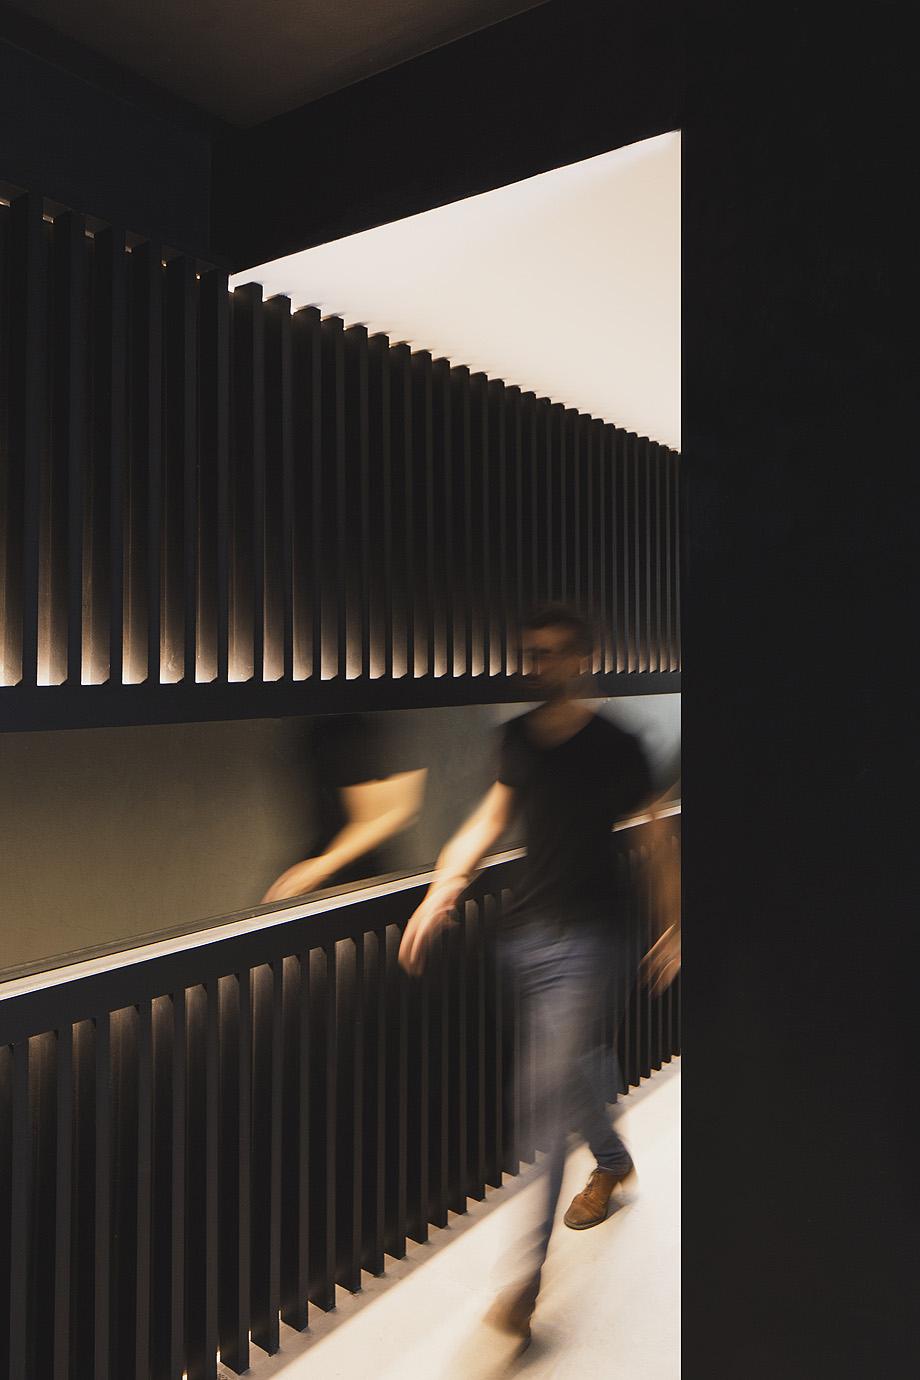 restaurante raco de l'arnau de carles segarra - foto - david zarzoso (1)